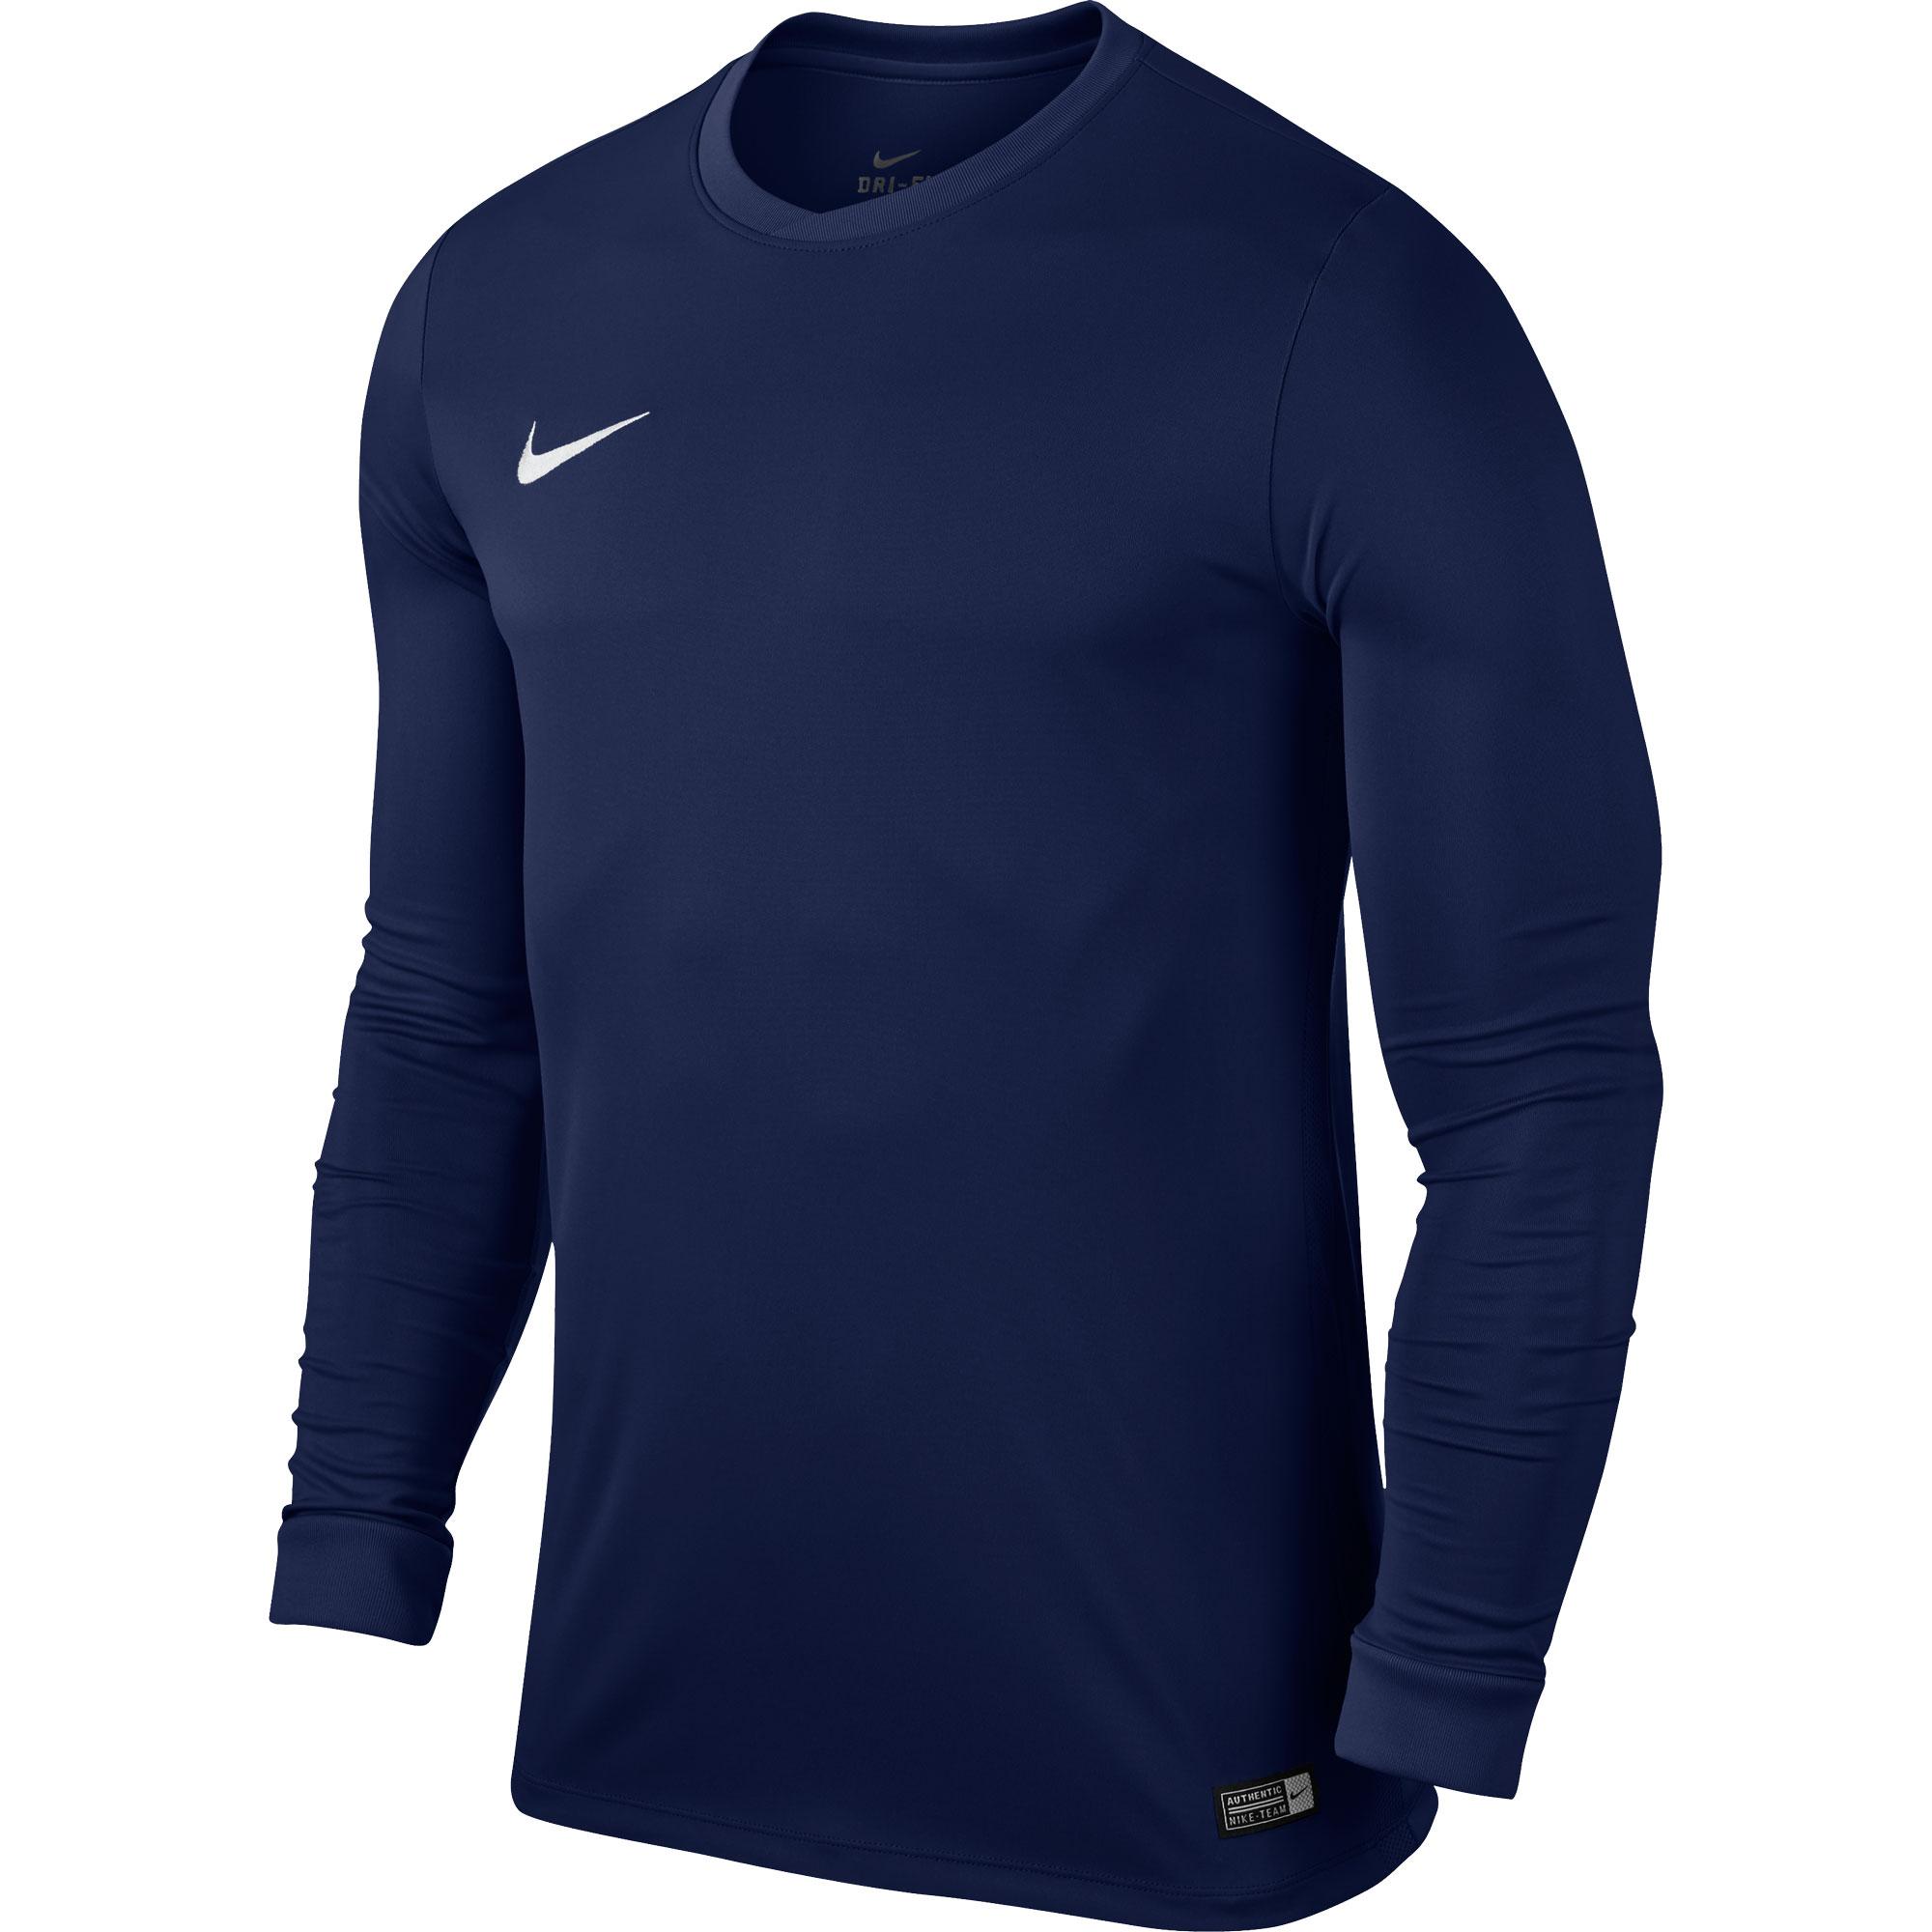 Nike Herren Langarm Trikot Park VI 725884-410 S